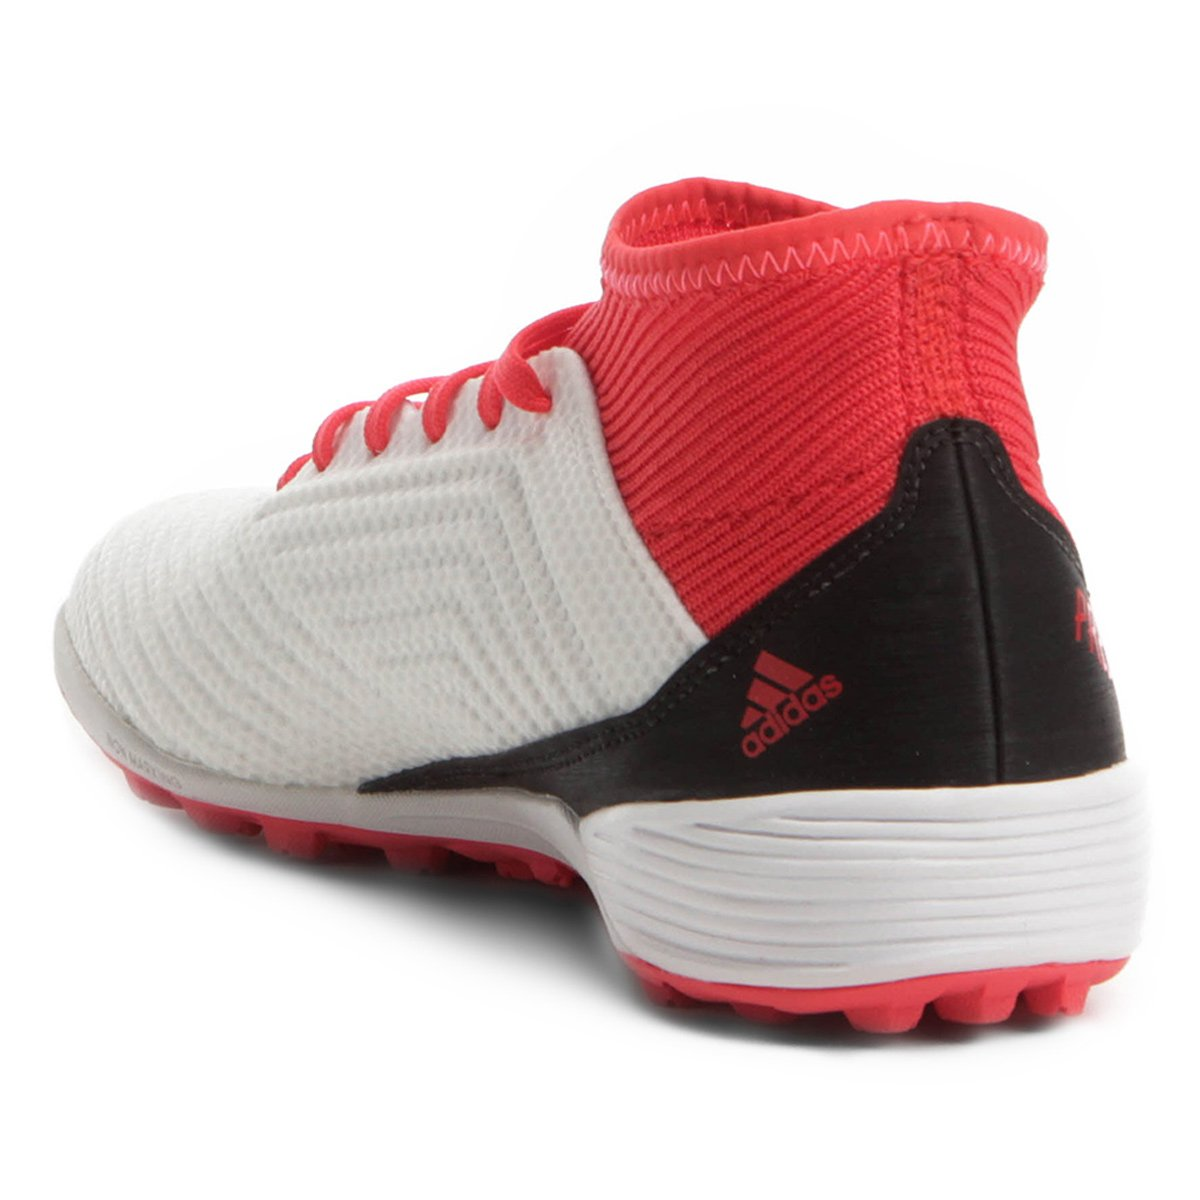 e681548309 Chuteira Society Adidas Predator 18 3 TF - Branco e Vermelho ...